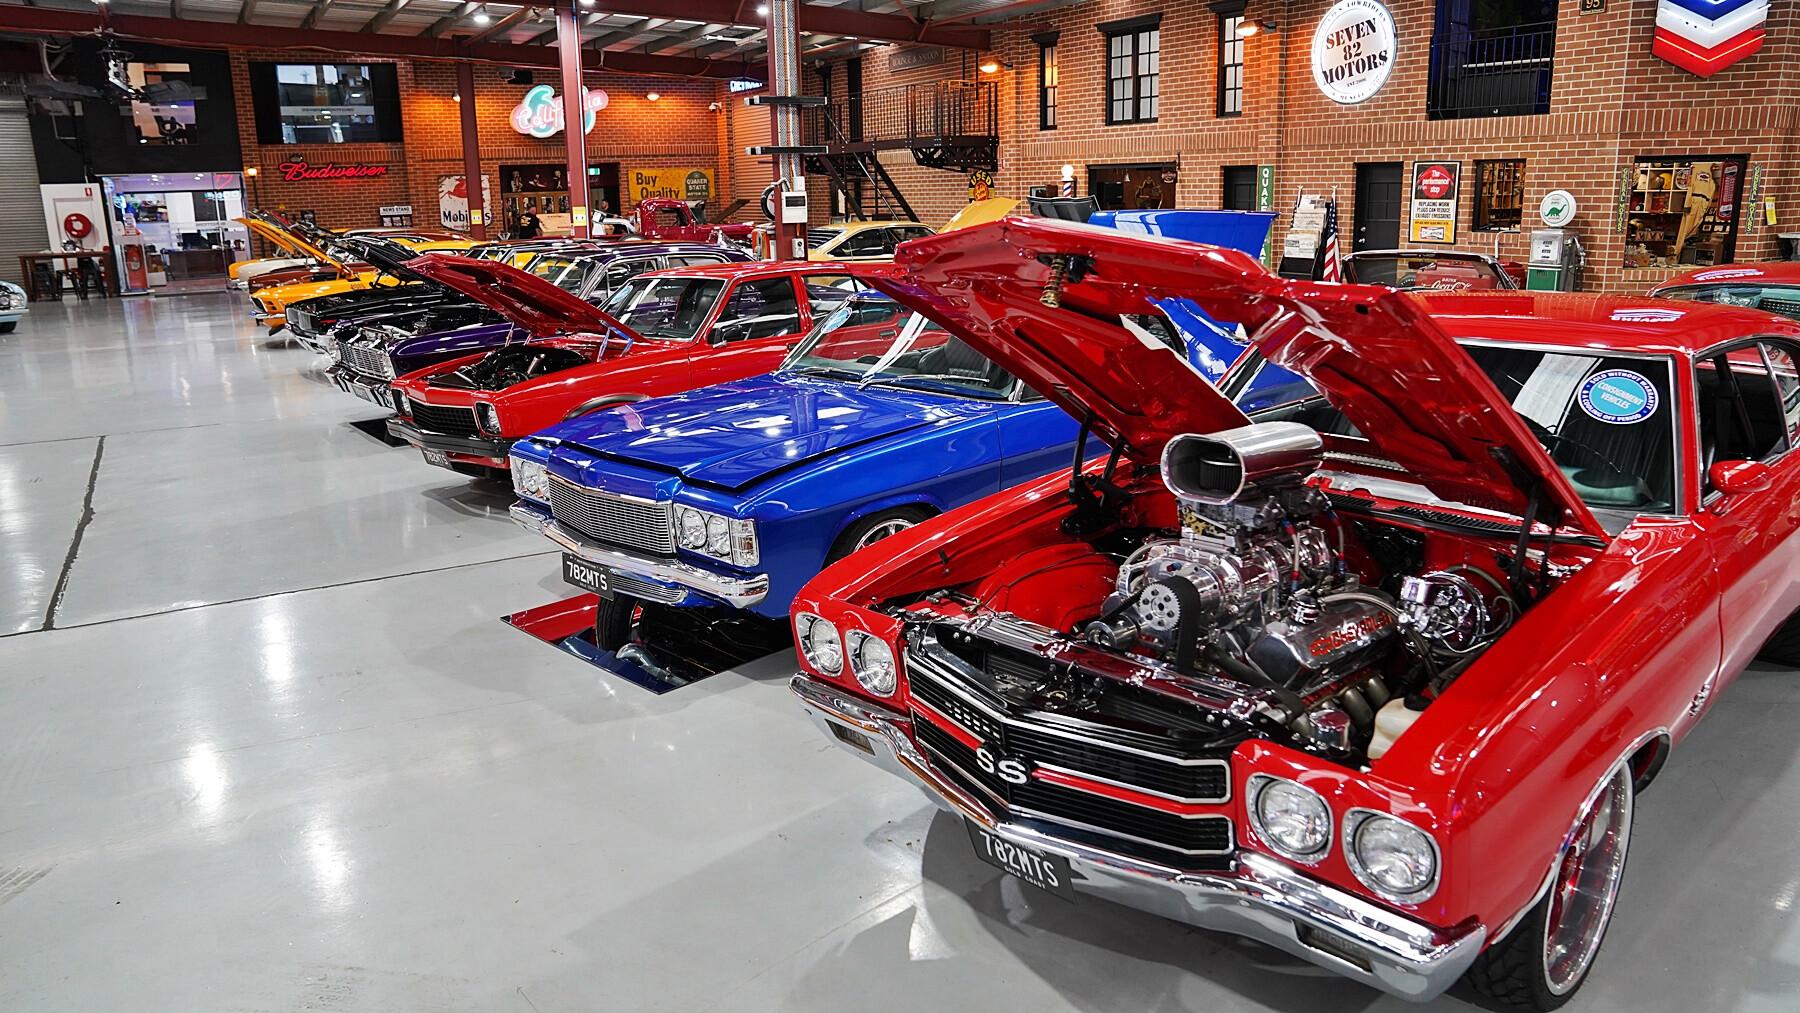 Street Machine News Seven 82 Motor Auction 4